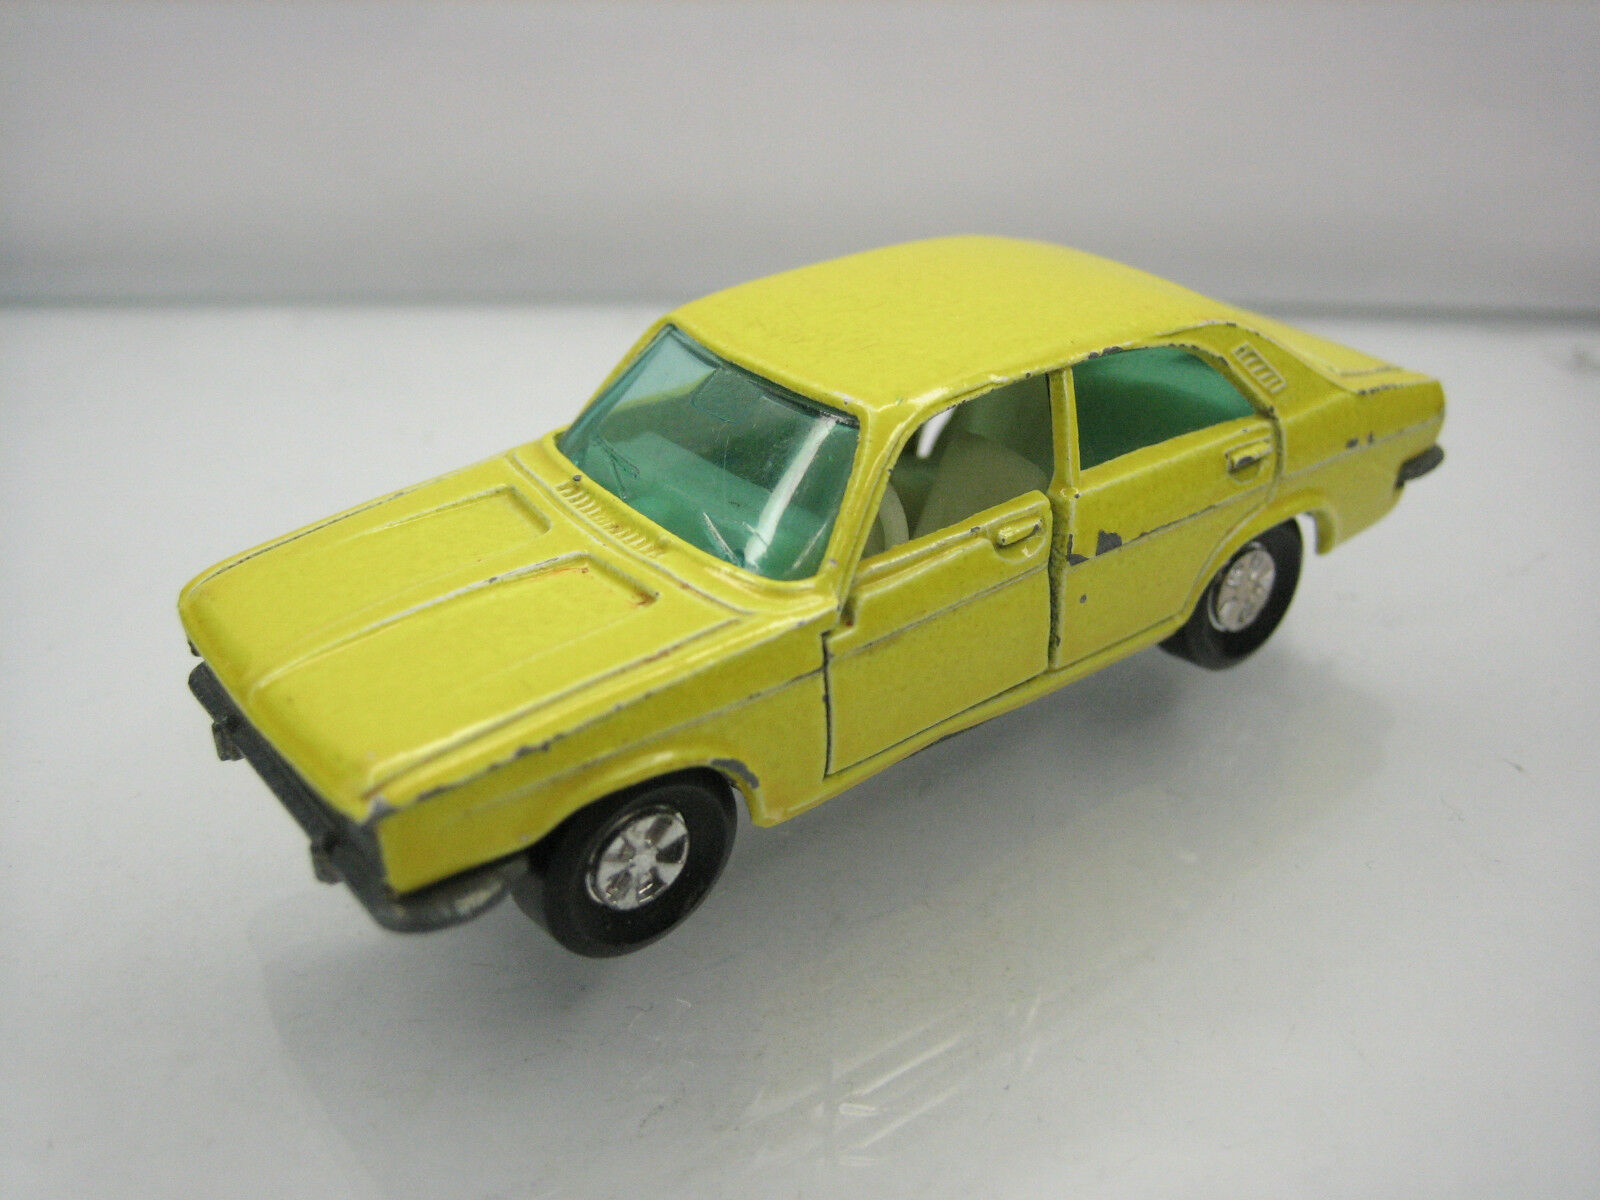 Diecast Majorette Chrysler 180 No. 208 Yellow Good Condition Very Rare